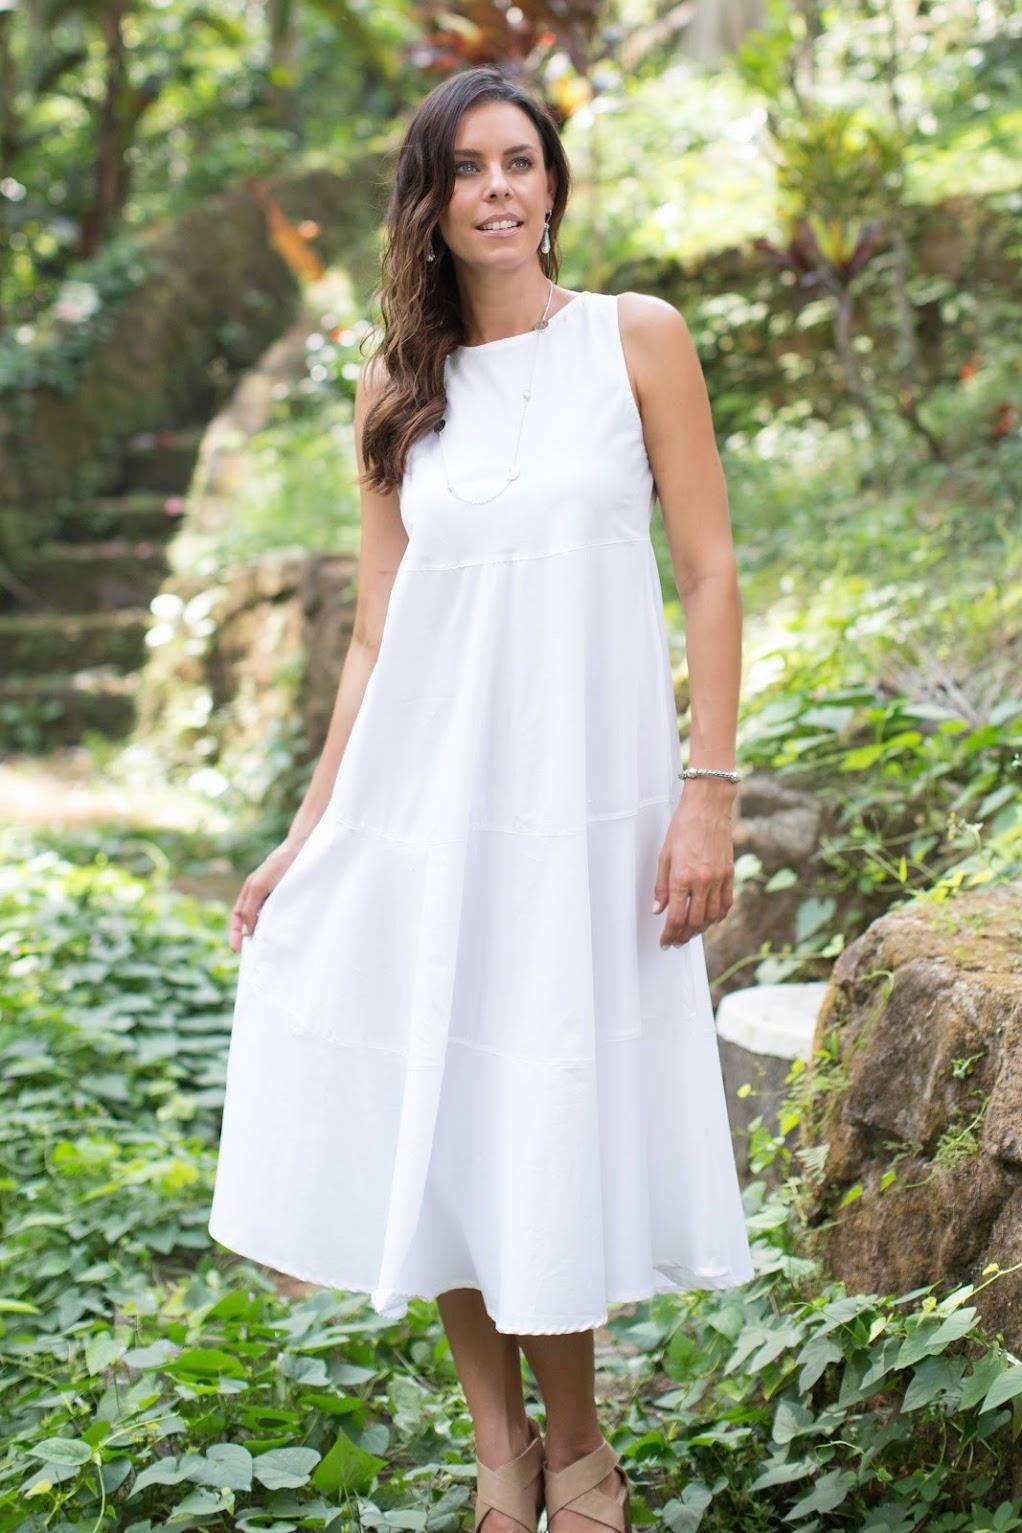 https://www.novica.com/p/sleeveless-knee-length-cotton-dress-from/222803/